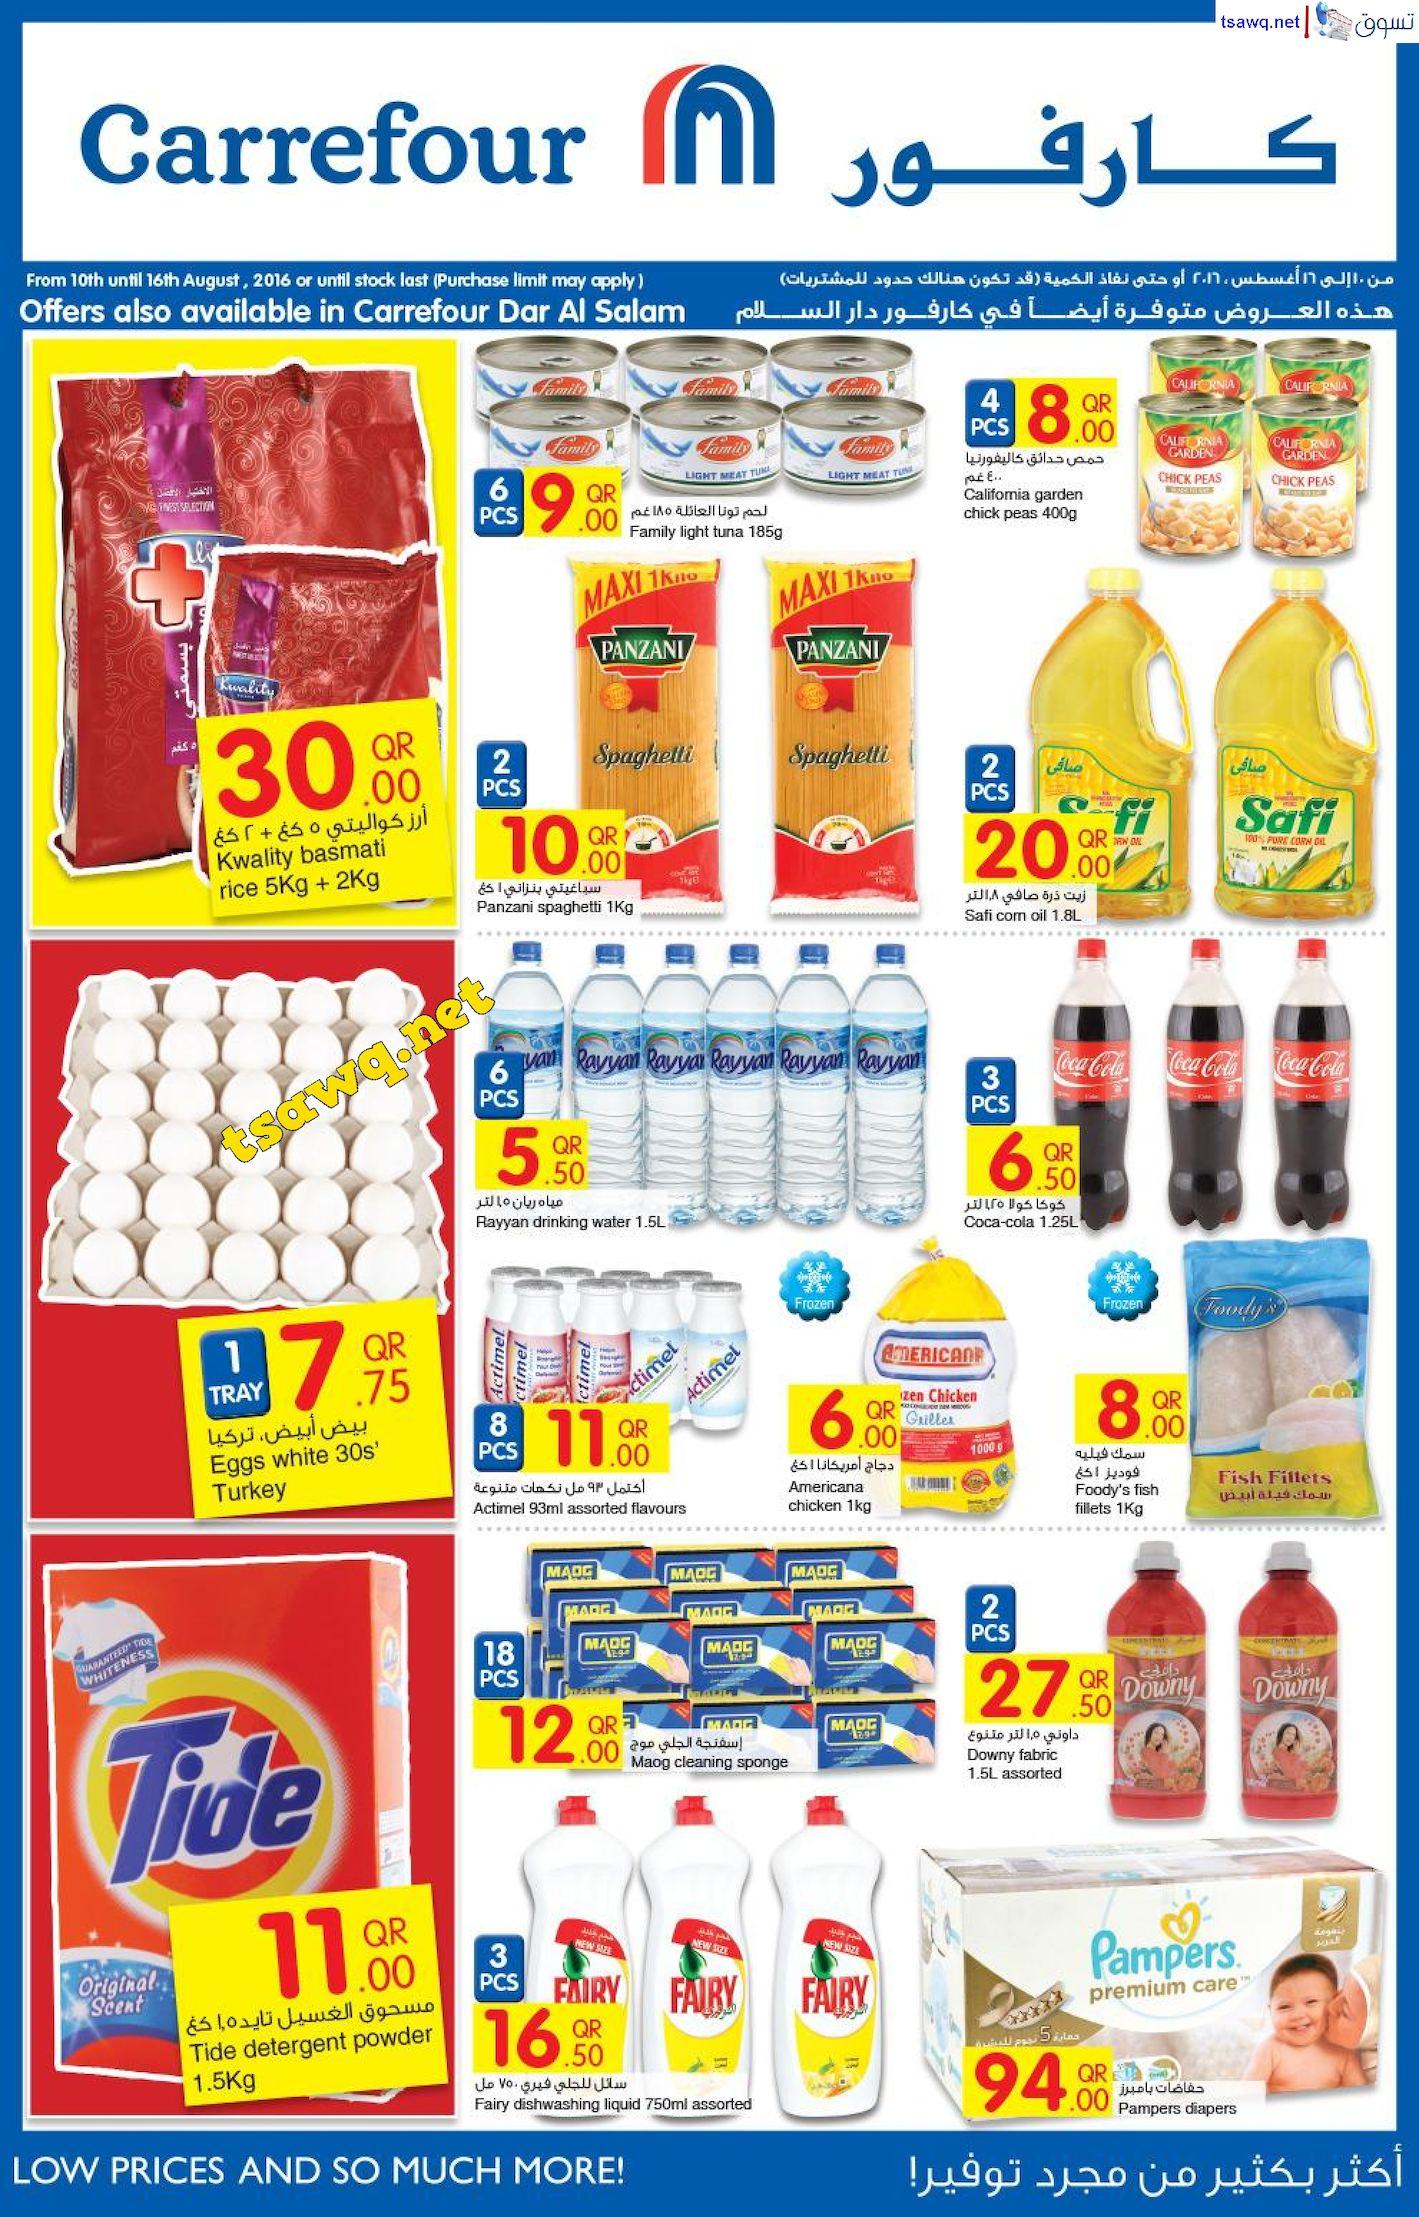 81435c4c6 عروض كارفور قطر من 10 أغسطس حتى 16 أغسطس 2016 Best Deal   تسوق نت